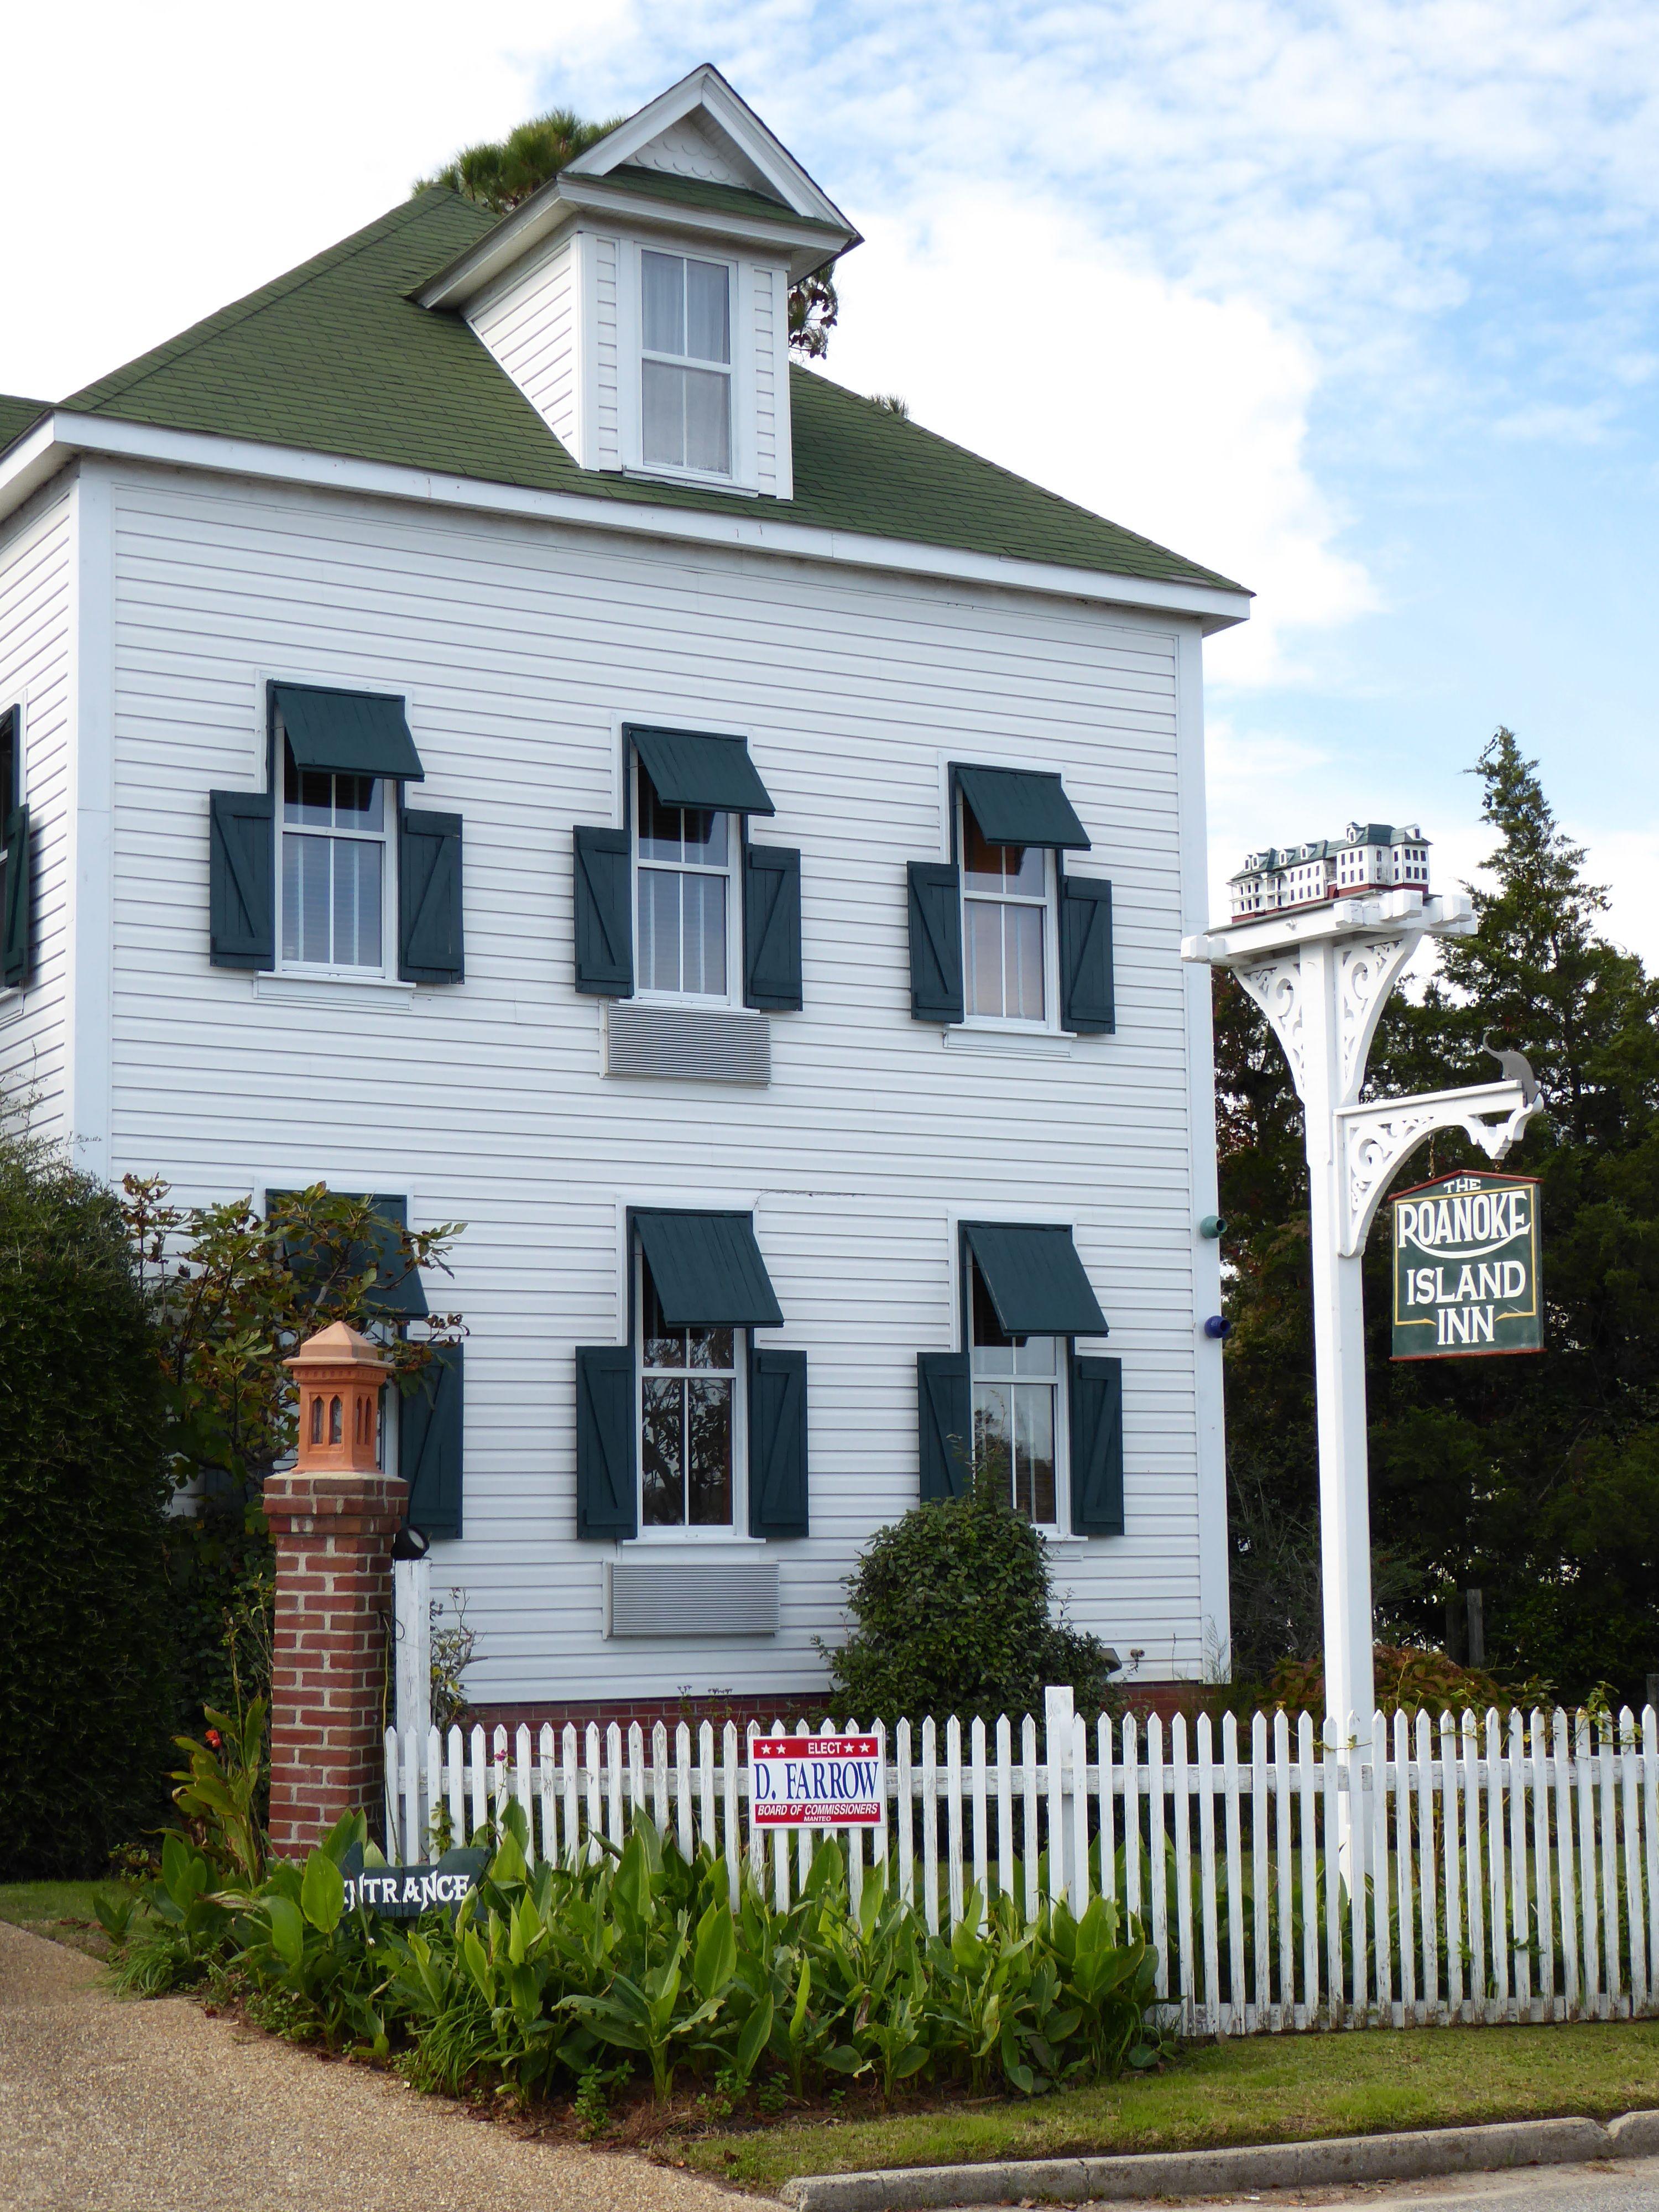 Roanoke Island Inn Manteo Nc Roanoke Island Island Inn Albemarle Sound